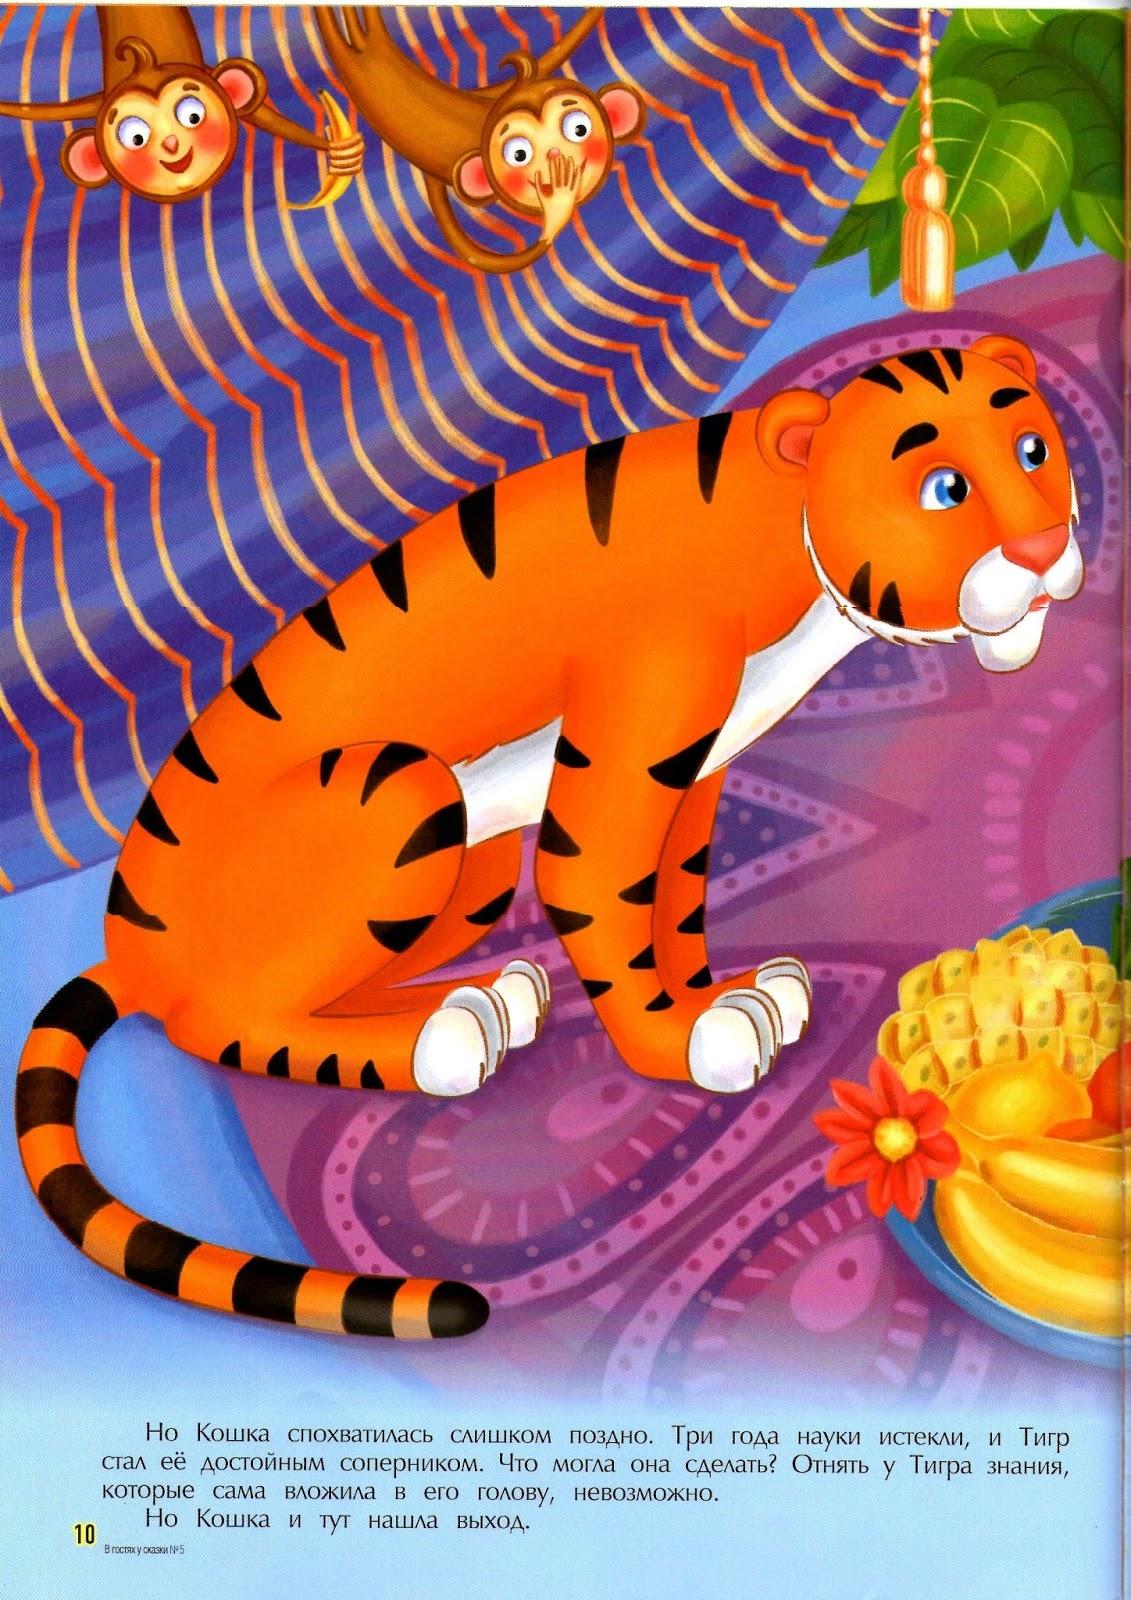 материала стеклопластика сказка про тигренка с картинками древним писаниям